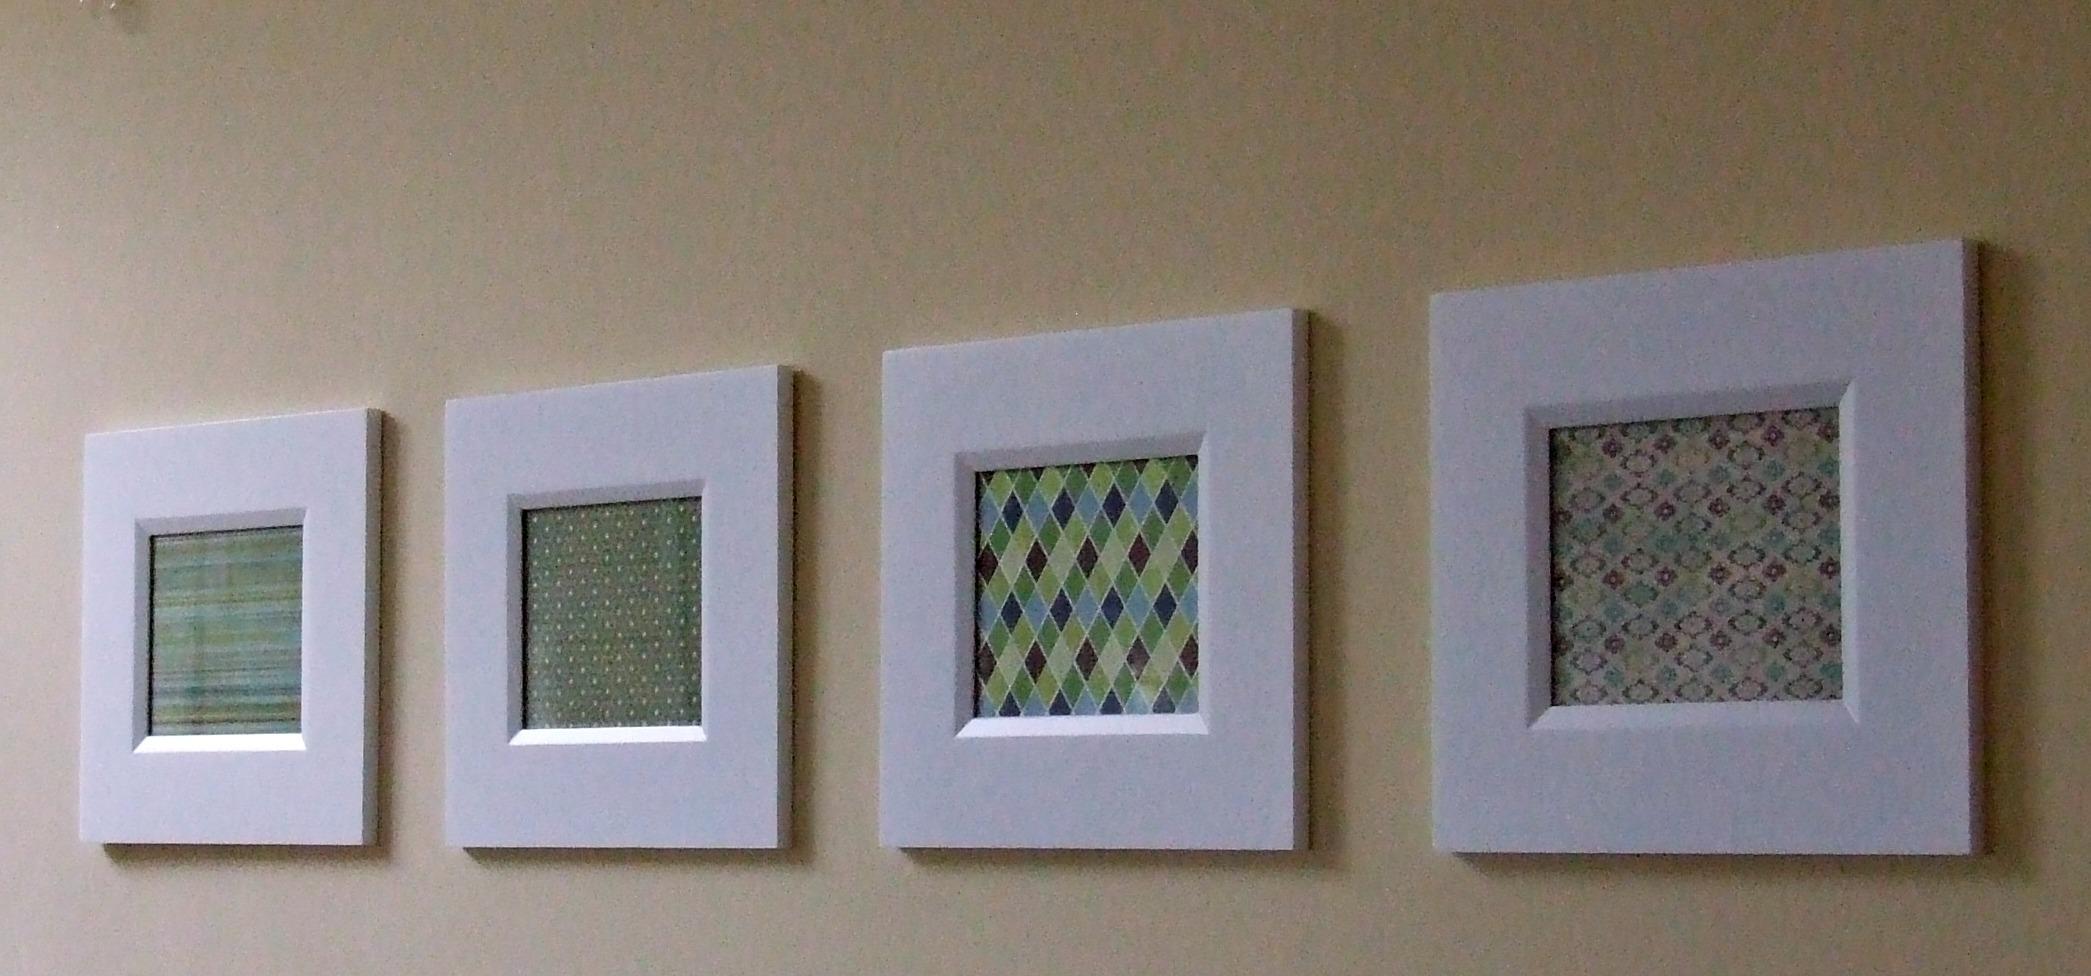 Uncategorized Art Framing Ideas picture frame art ideas gallery craft decoration images choice image decoration